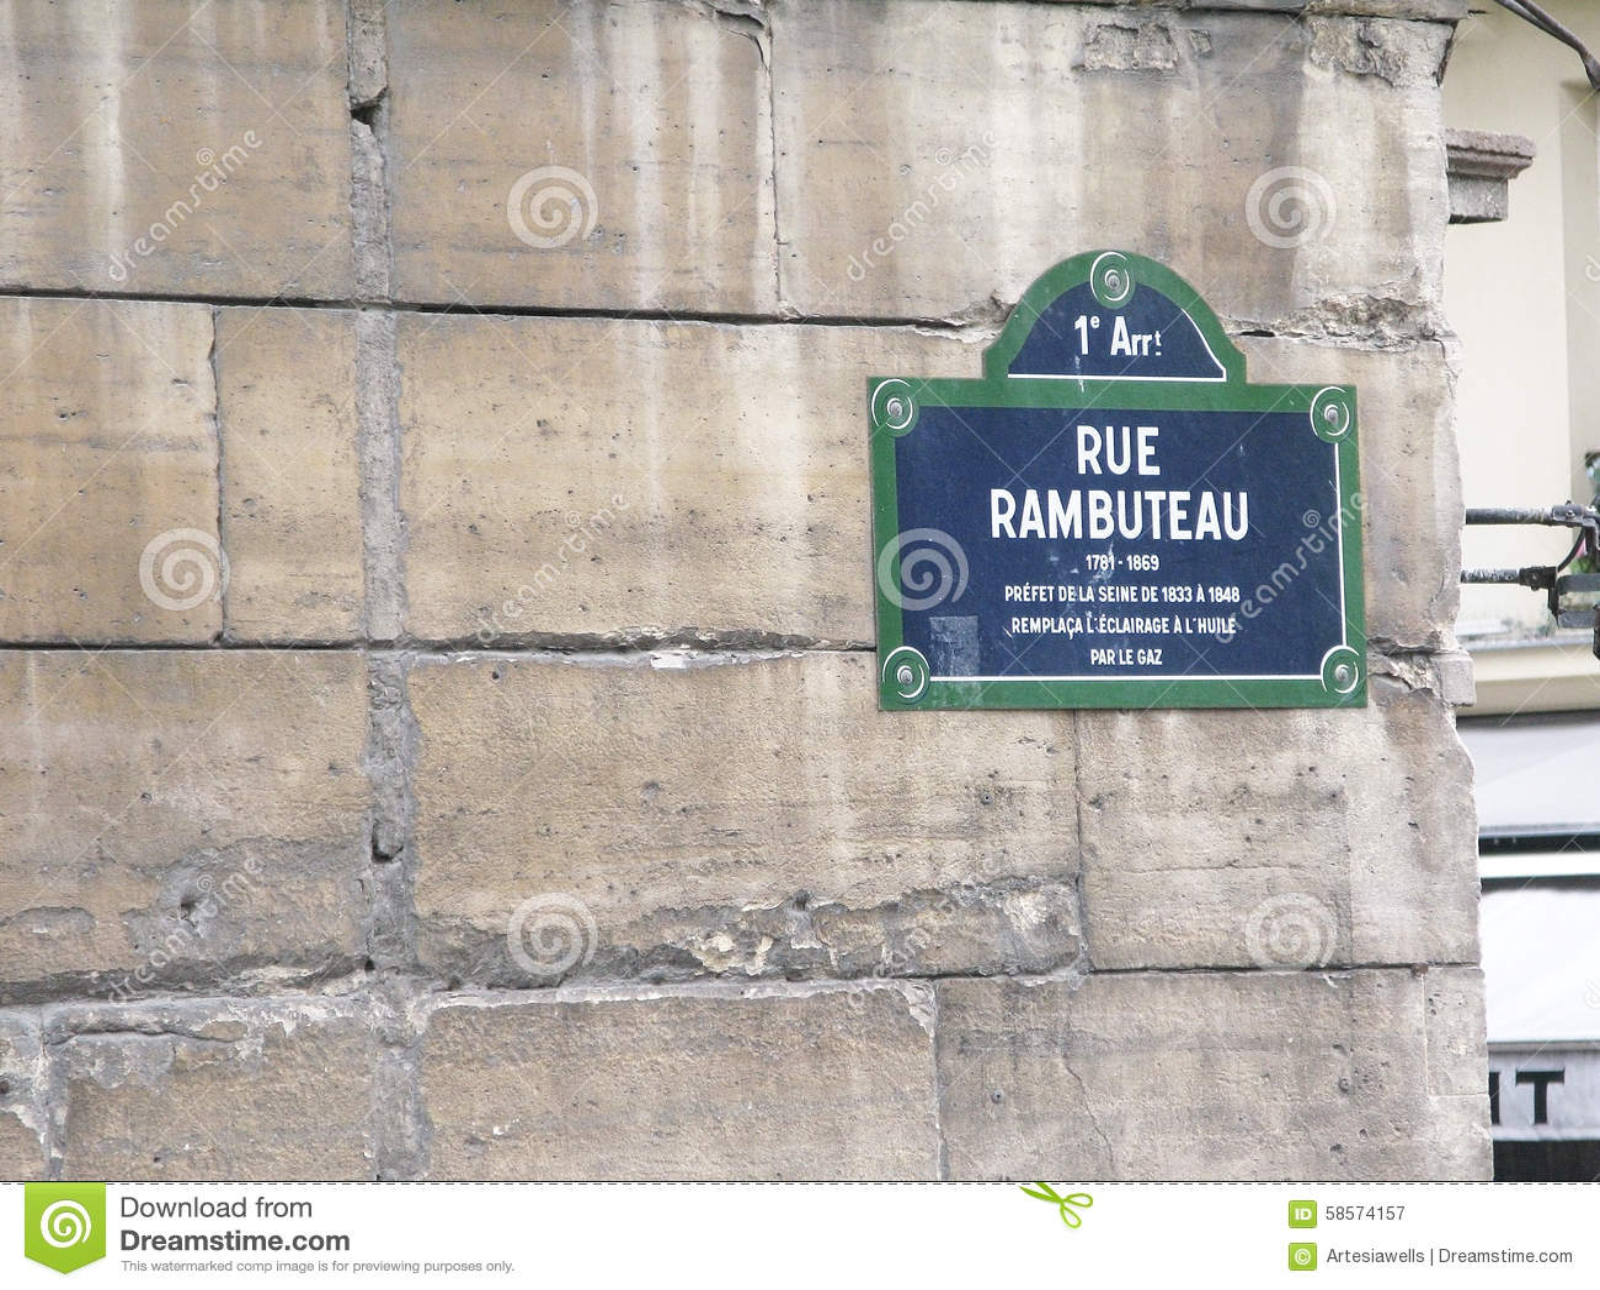 Rue rambuteau street sign editorial photography image 58574157 - Rue rambuteau paris ...